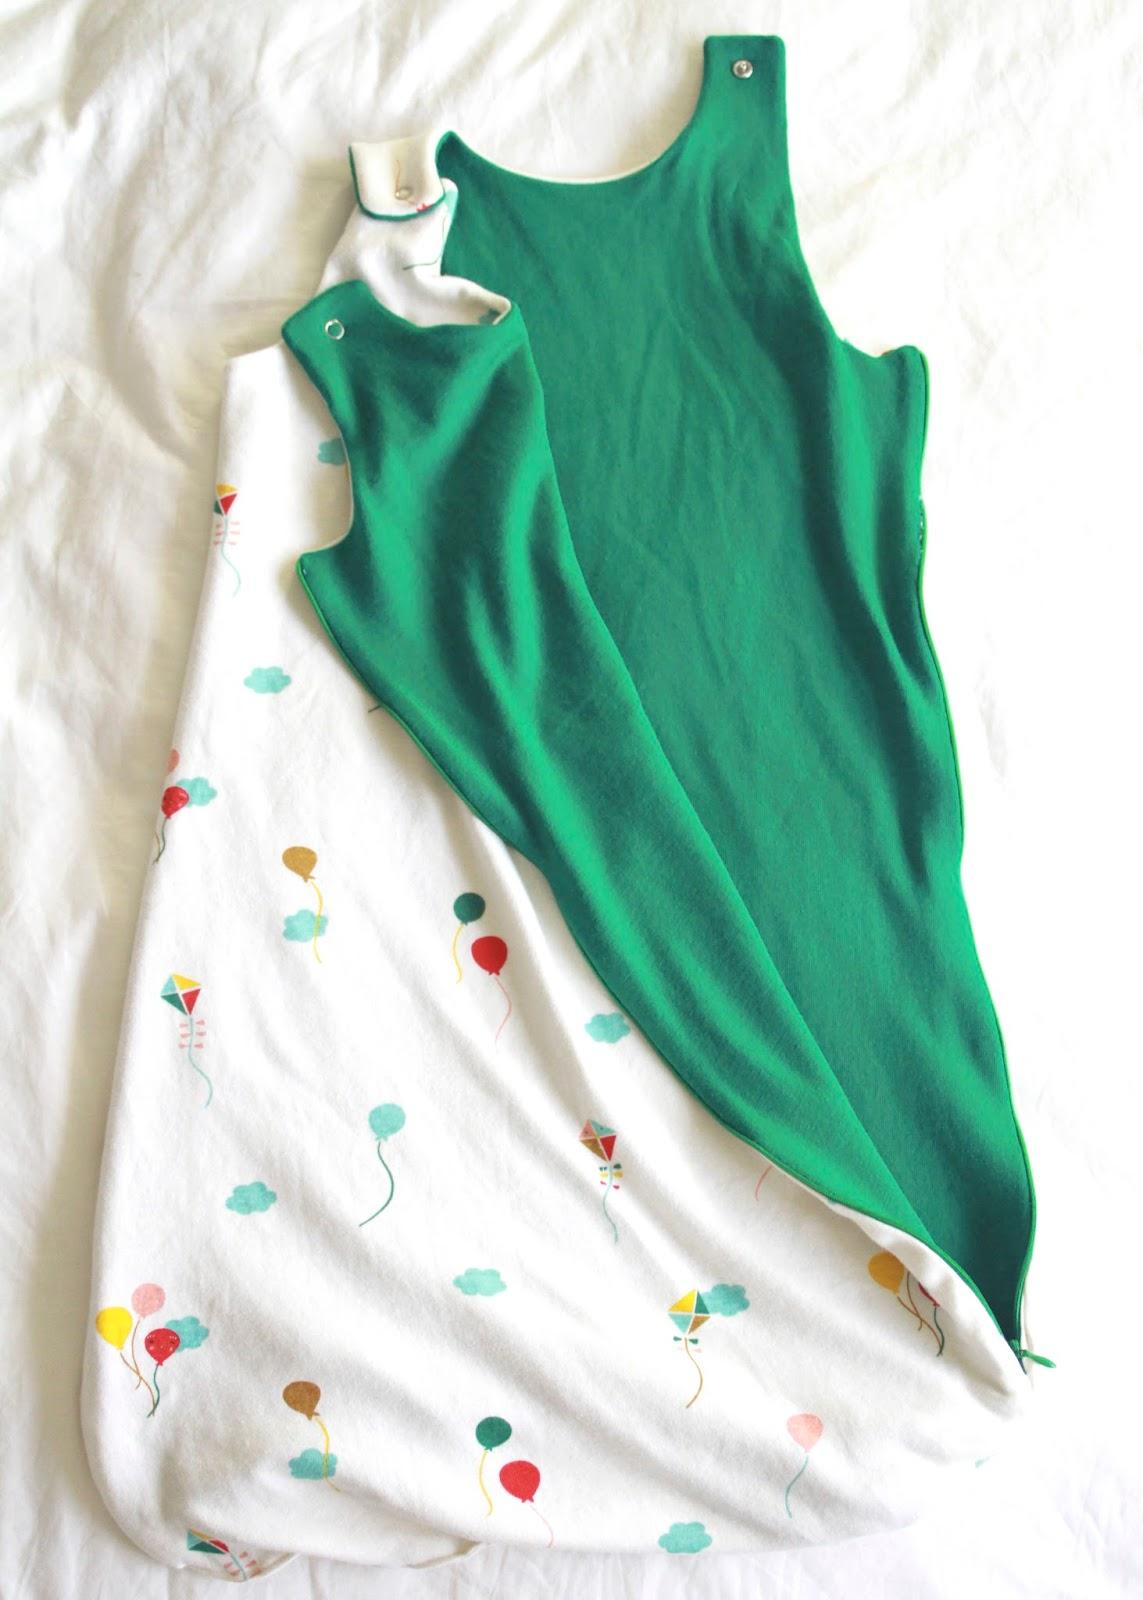 Nerd and Healthnut: Merino Wool Infant Sleep Sack